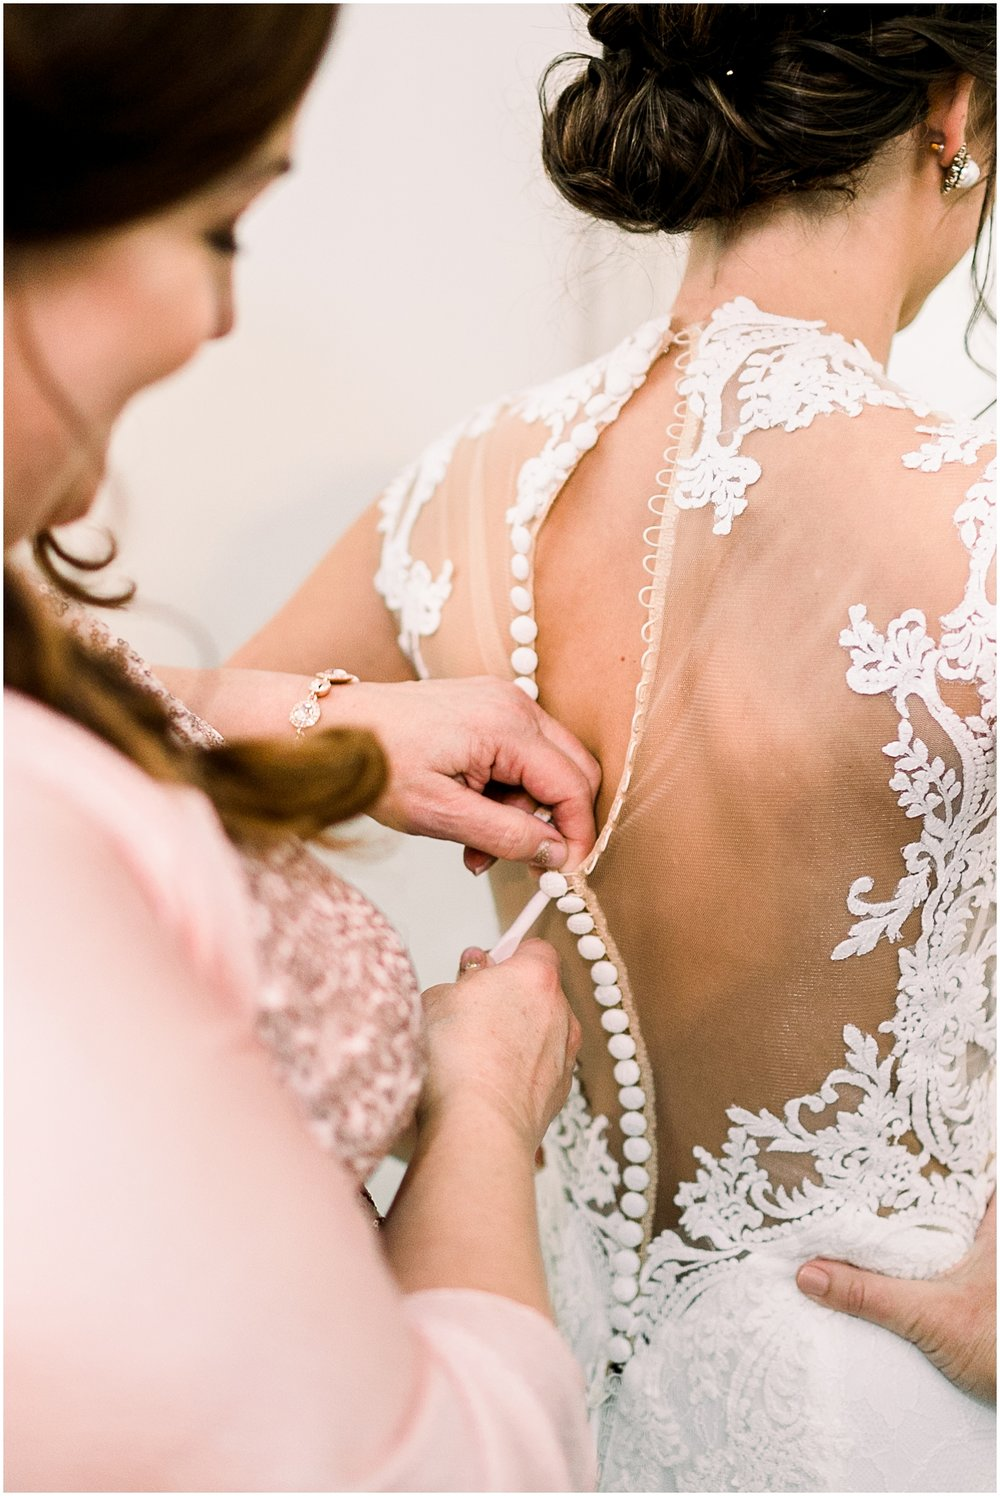 Wrightsville Manor Wedding Venue, Downtown Wilmington NC Wedding_Erin L. Taylor Photography_0003.jpg